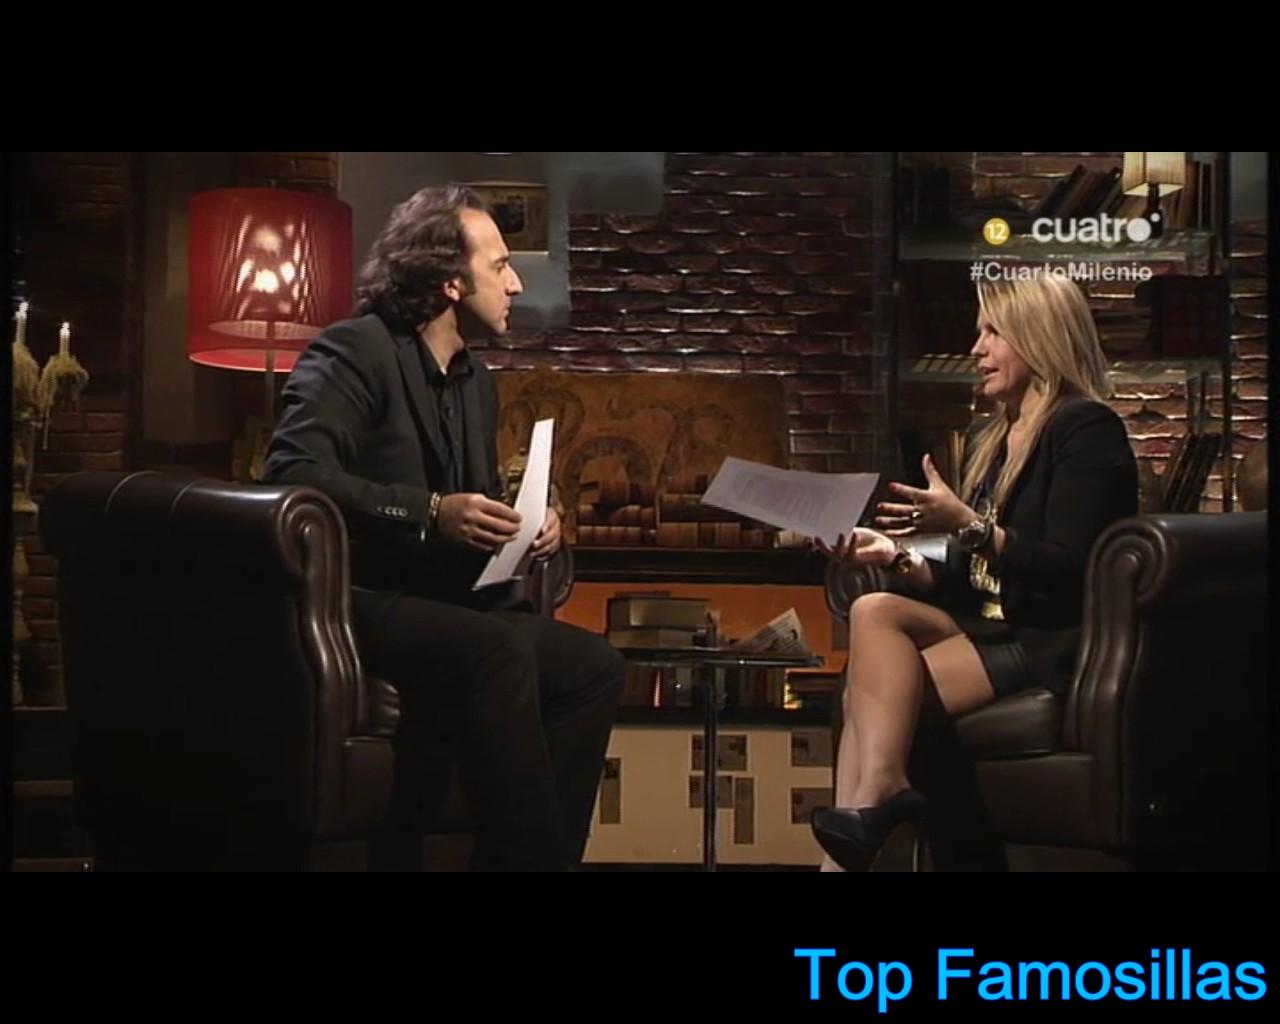 Top famosillas carmen porter presentadora de cuarto for Cuatro cuarto milenio